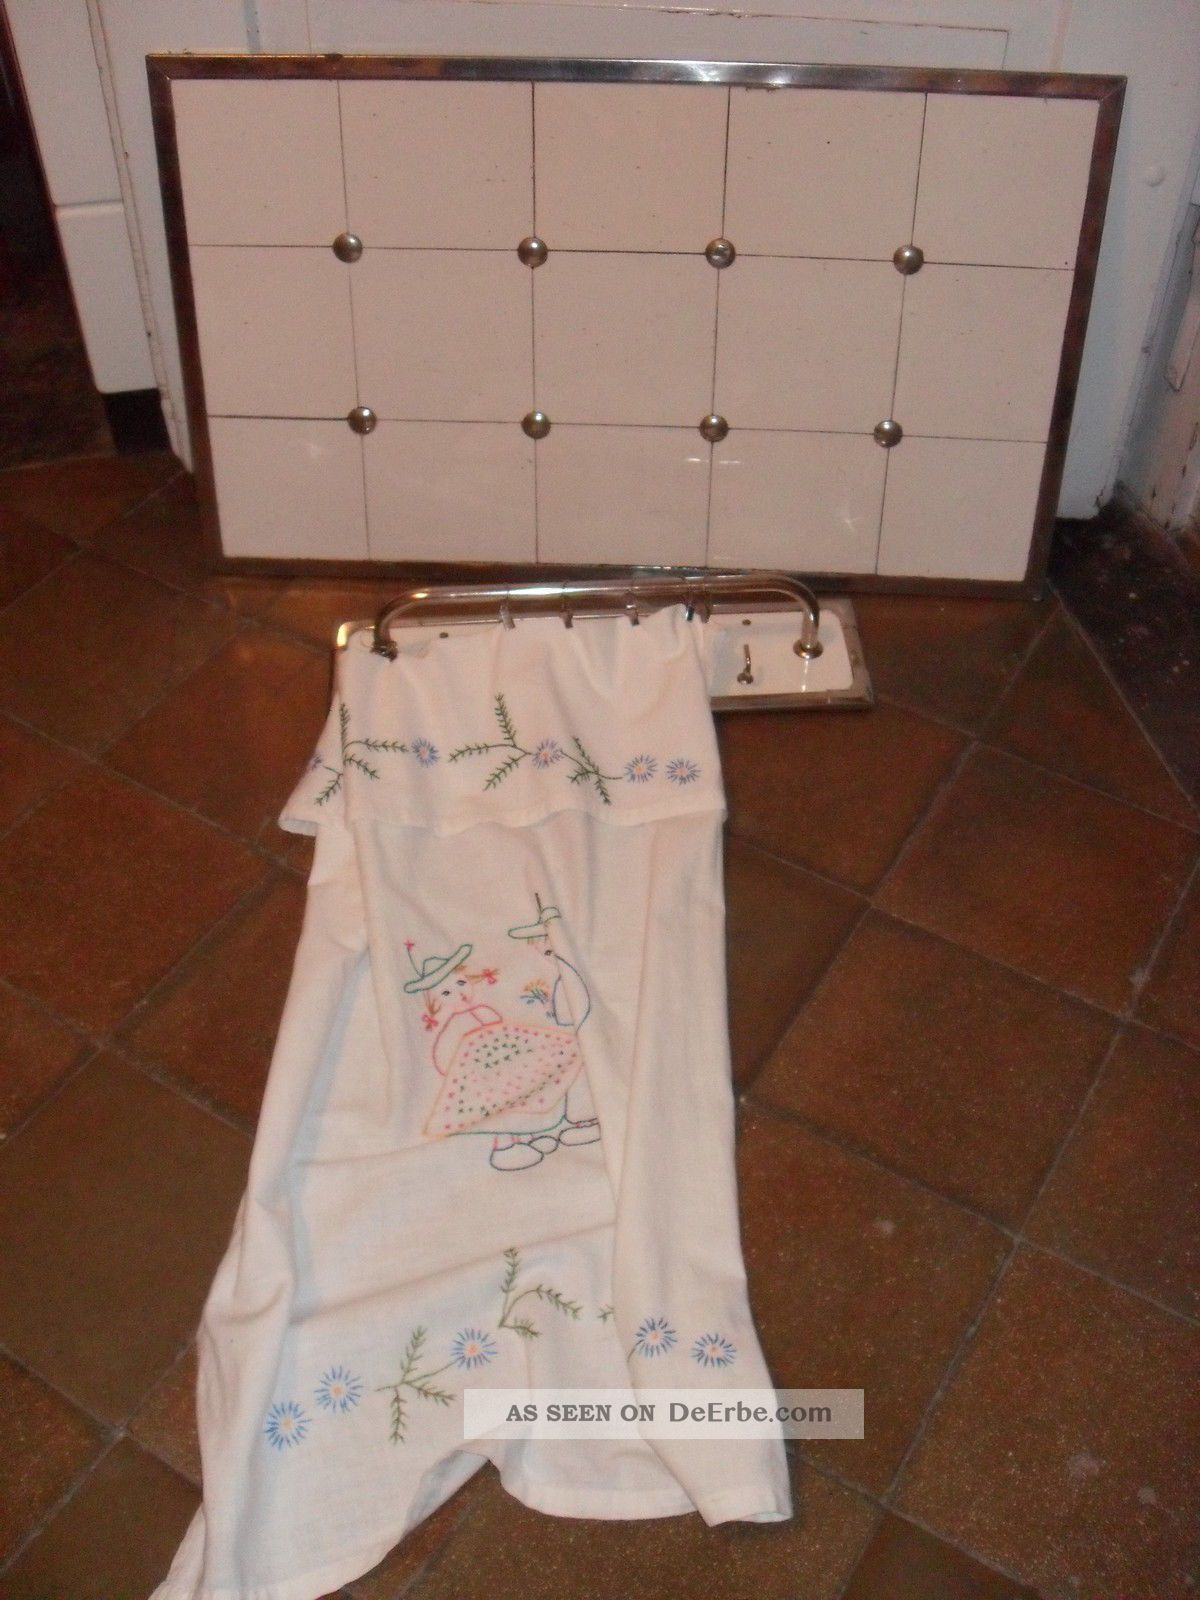 hakenleiste kche affordable hakenleiste kche frisch sch n. Black Bedroom Furniture Sets. Home Design Ideas